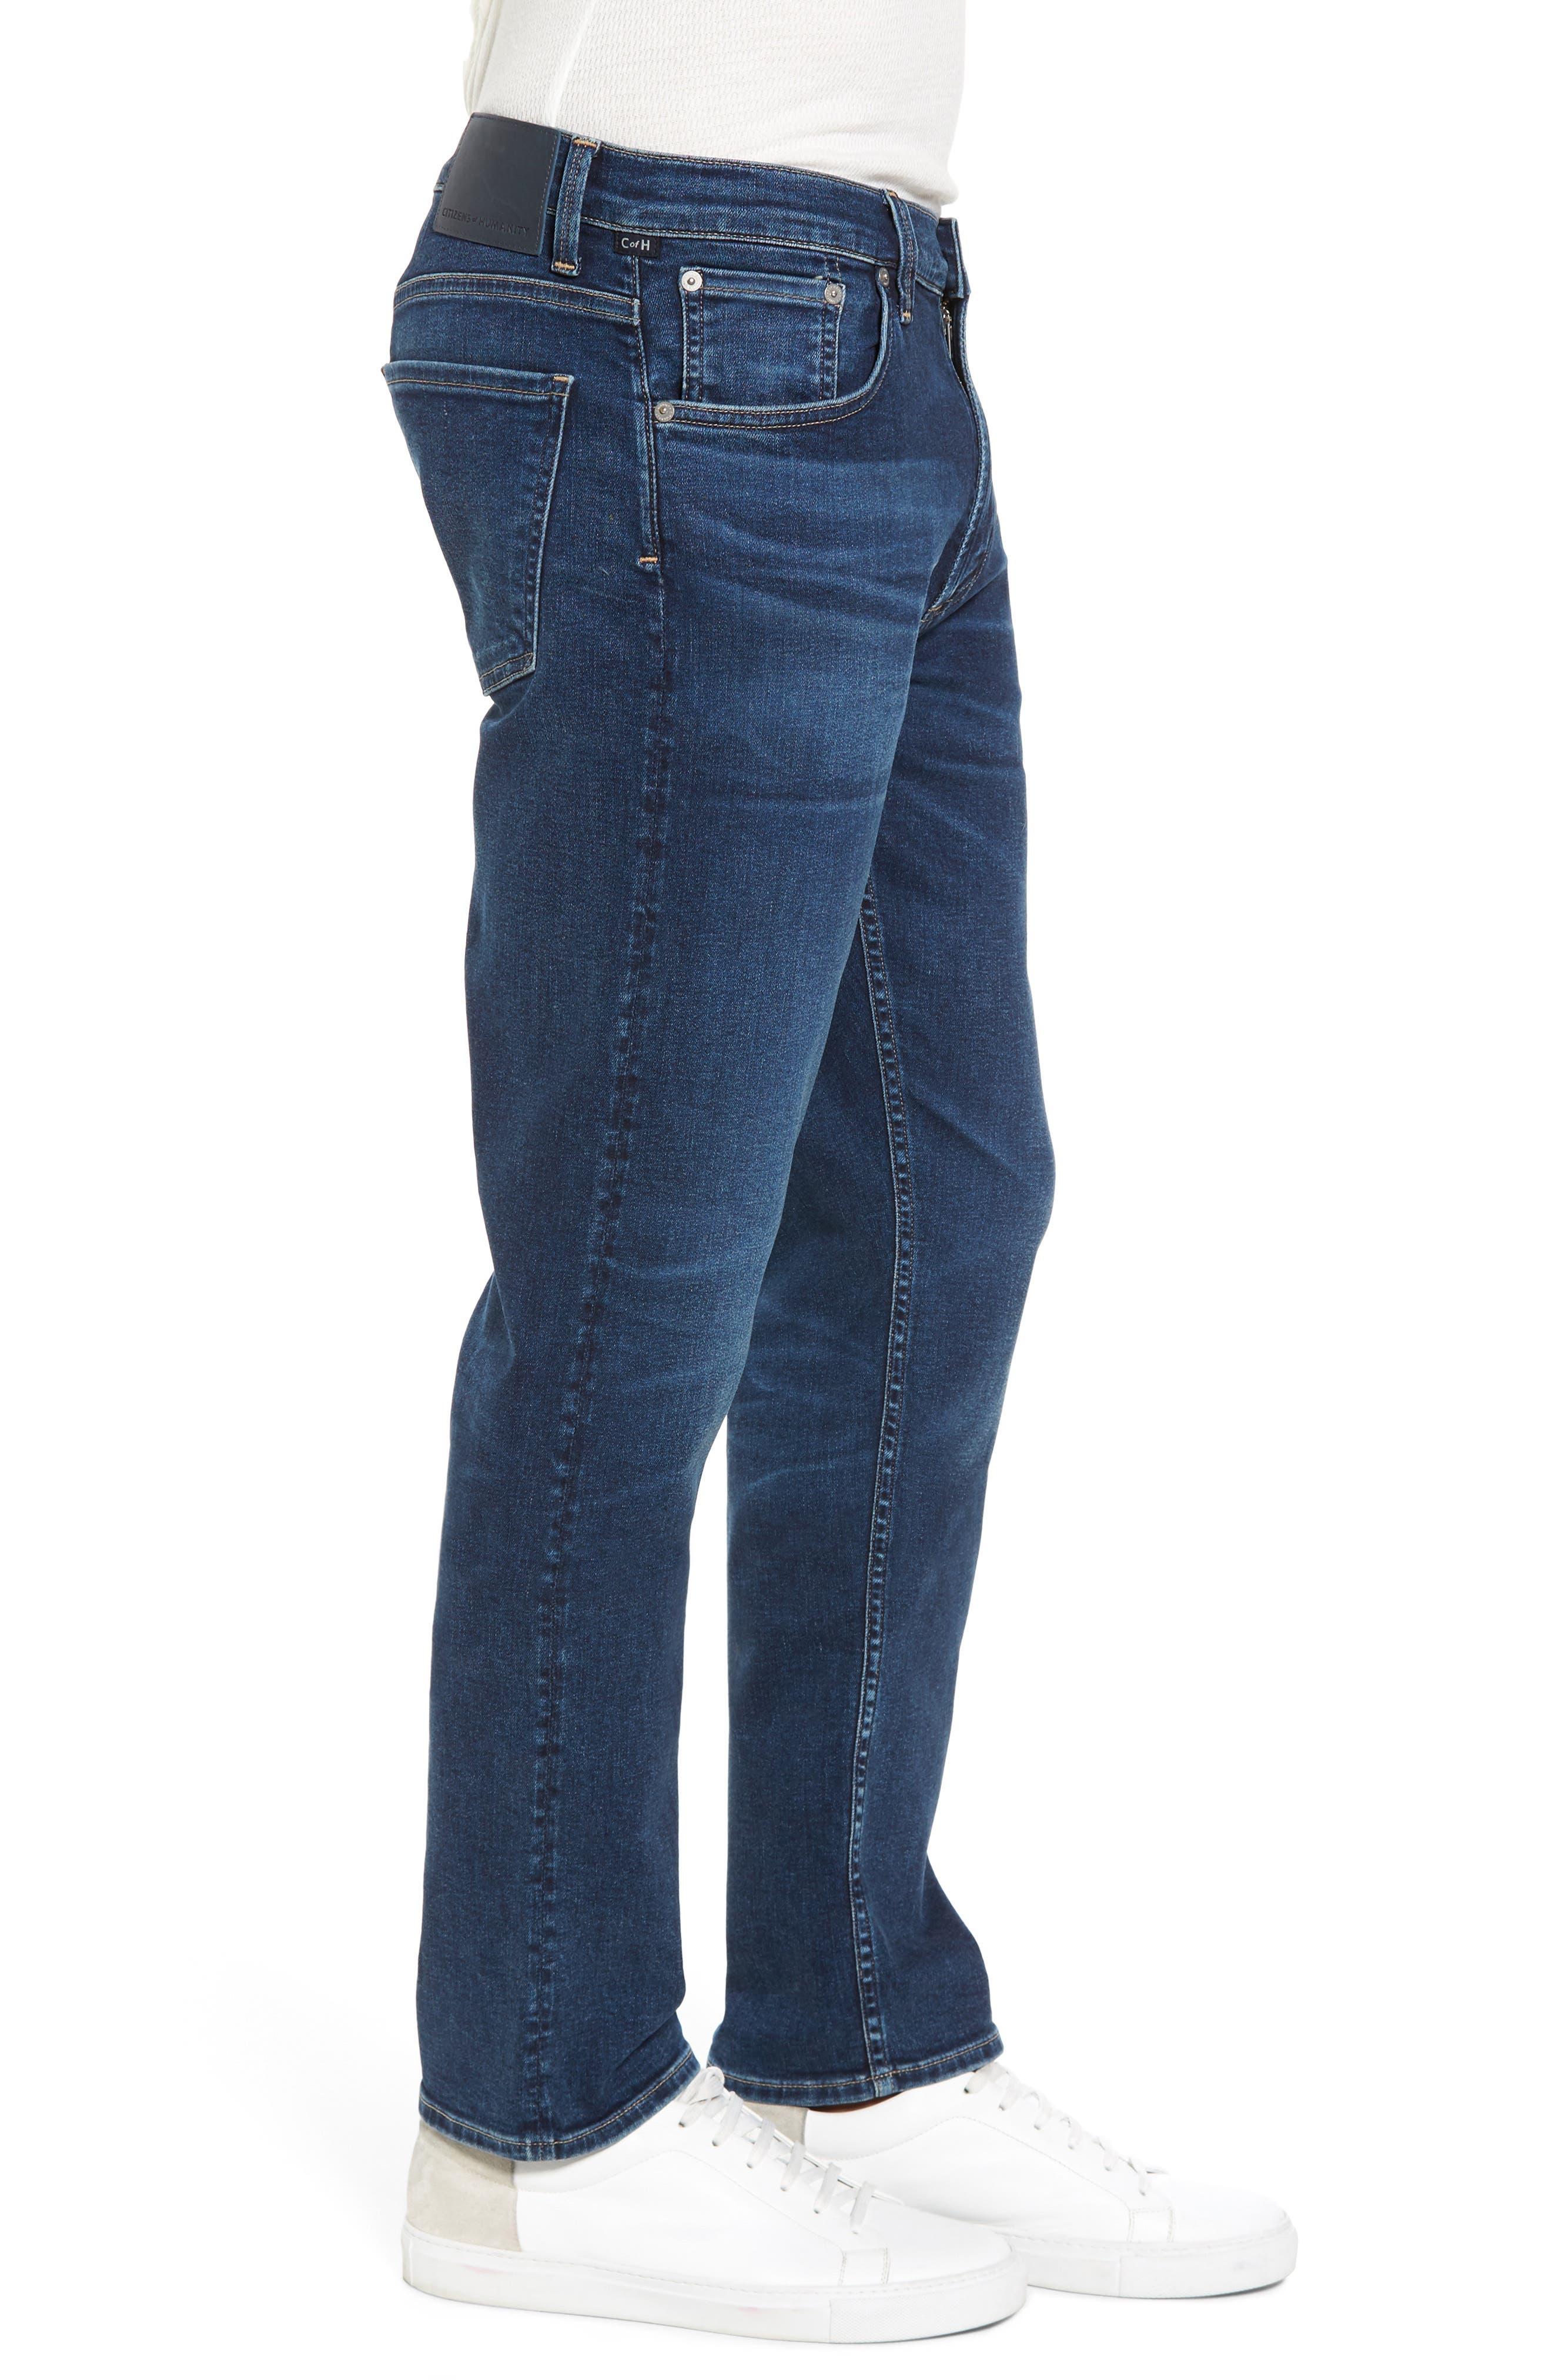 PERFORM - Gage Slim Straight Leg Jeans,                             Alternate thumbnail 3, color,                             Turner